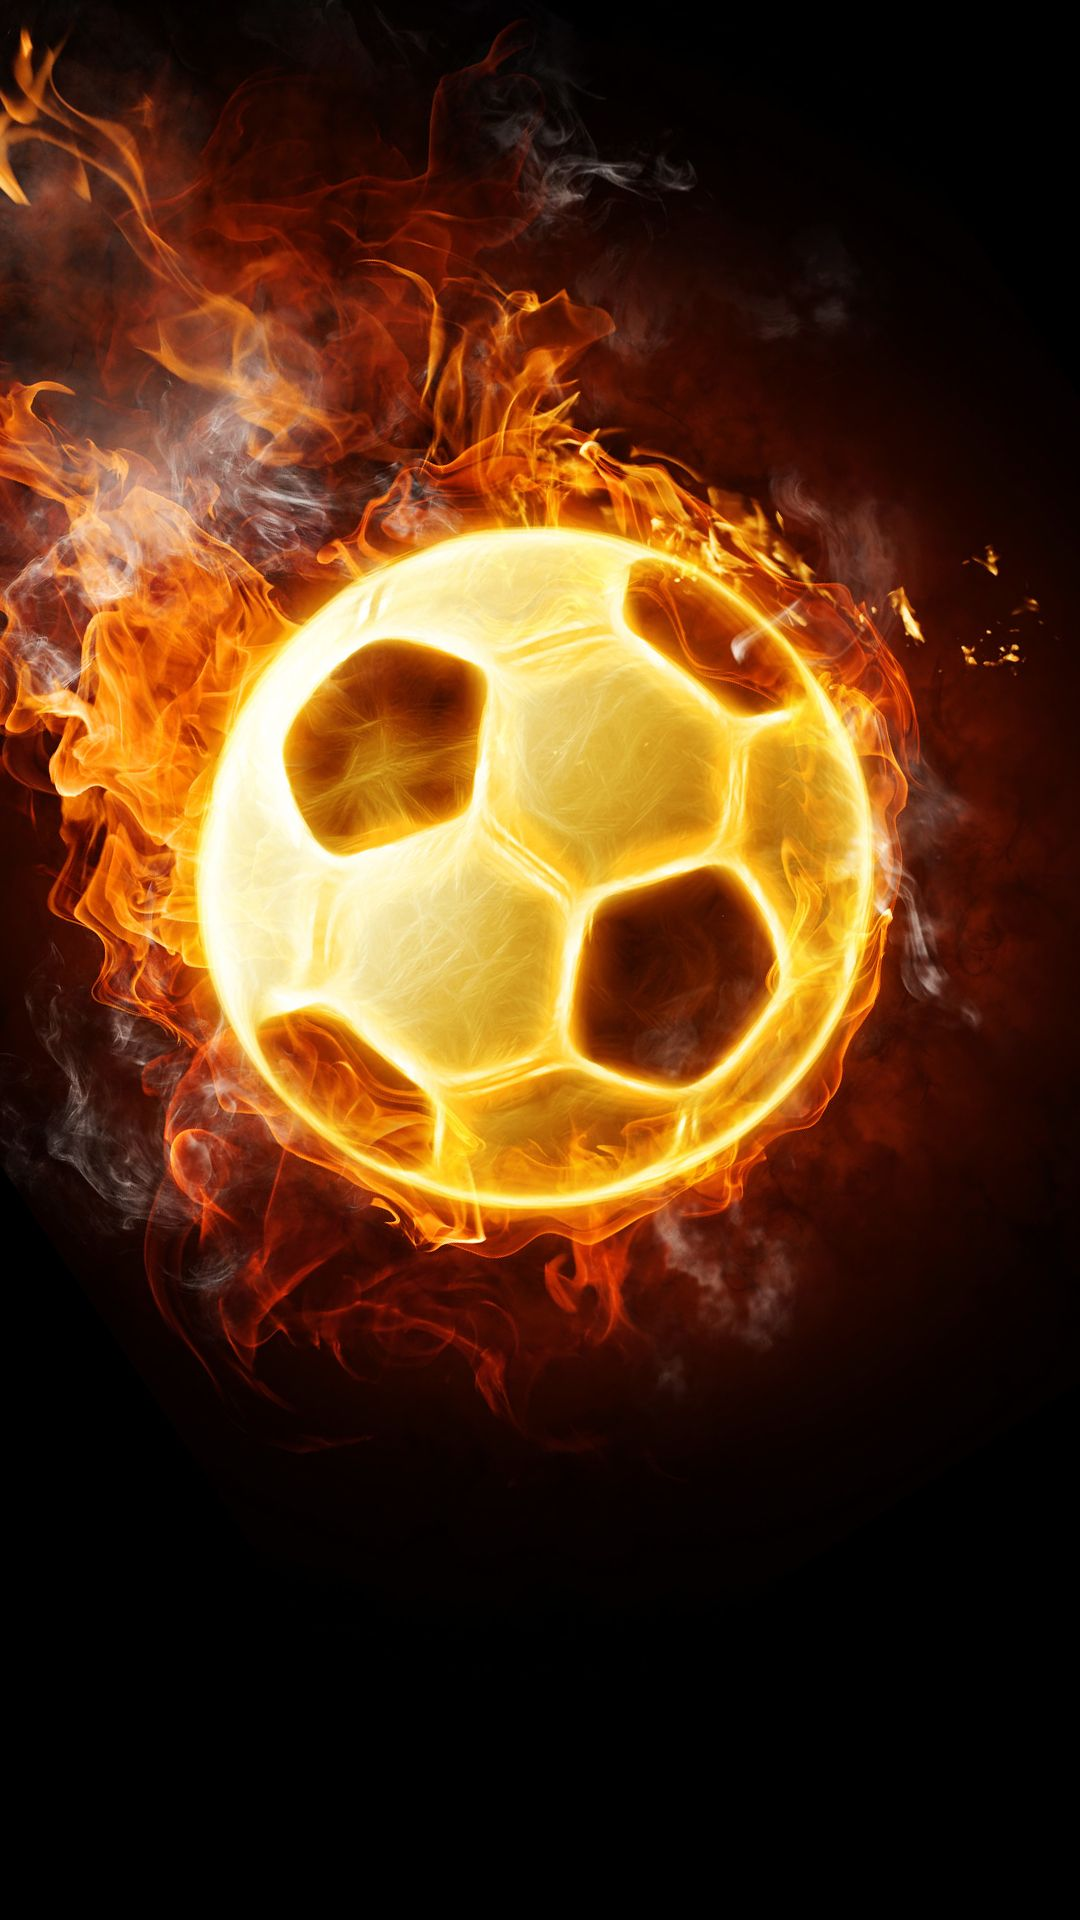 Football Wallpaper Ios Flip Wallpapers Download Free Wallpaper Hd In 2020 Soccer Ball Football Wallpaper Sports Wallpapers